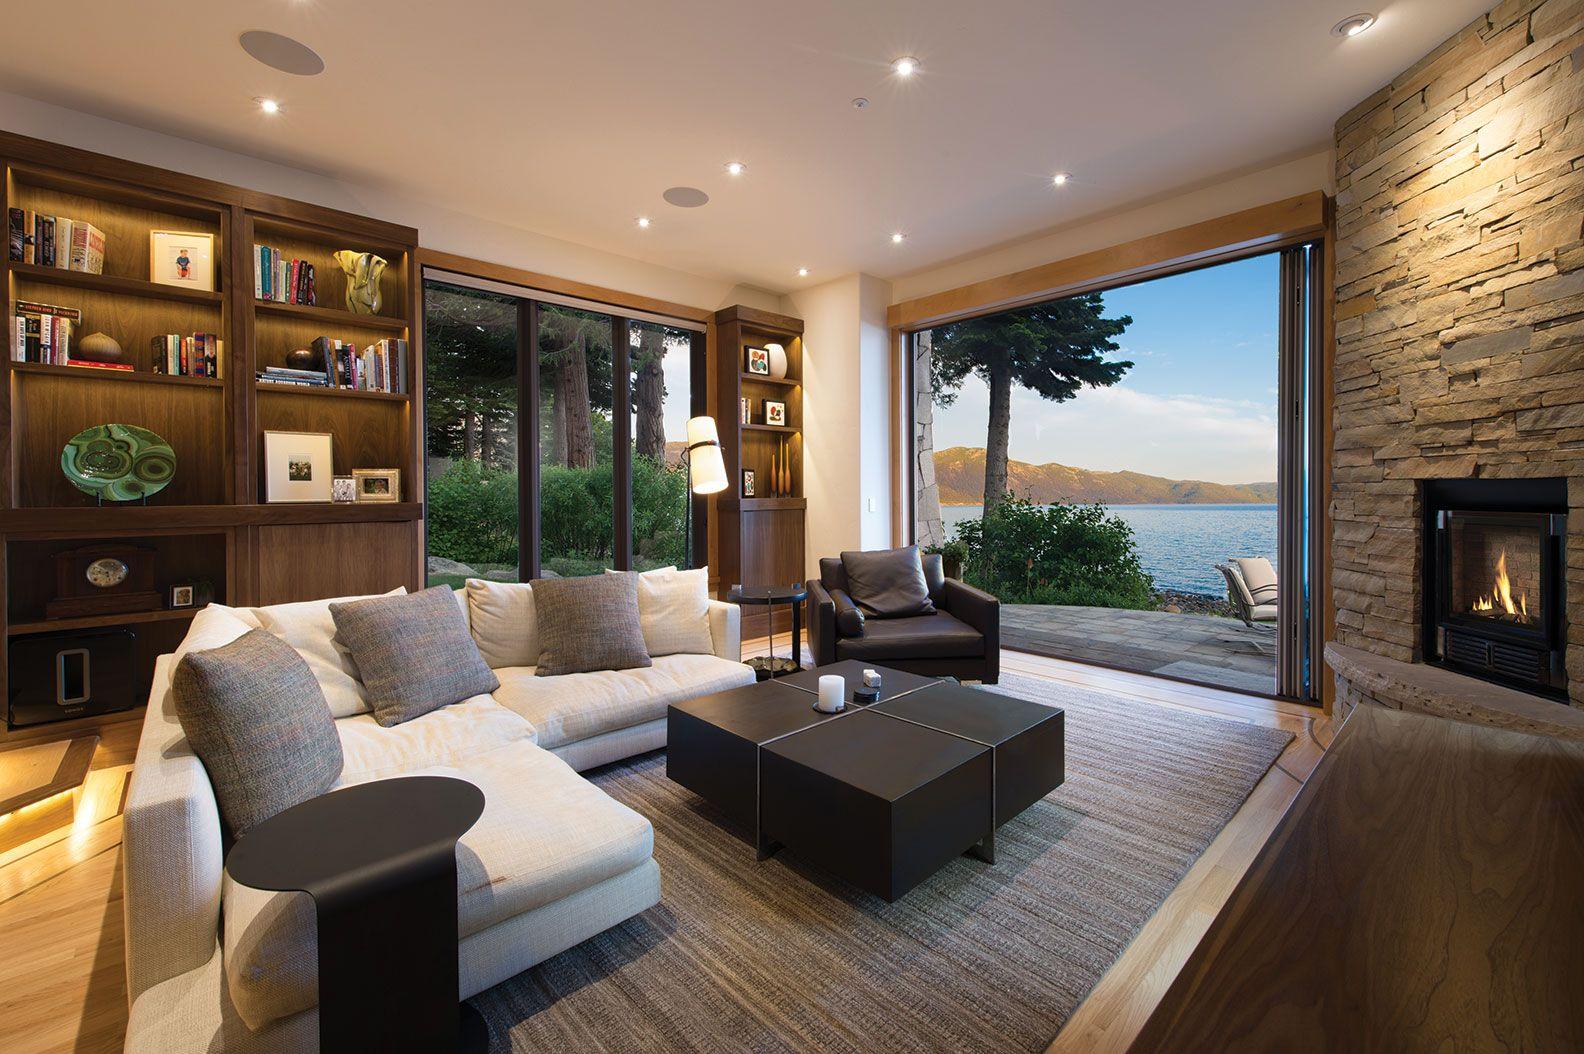 Village home interior design when their son wanted join the northstar california ski team a